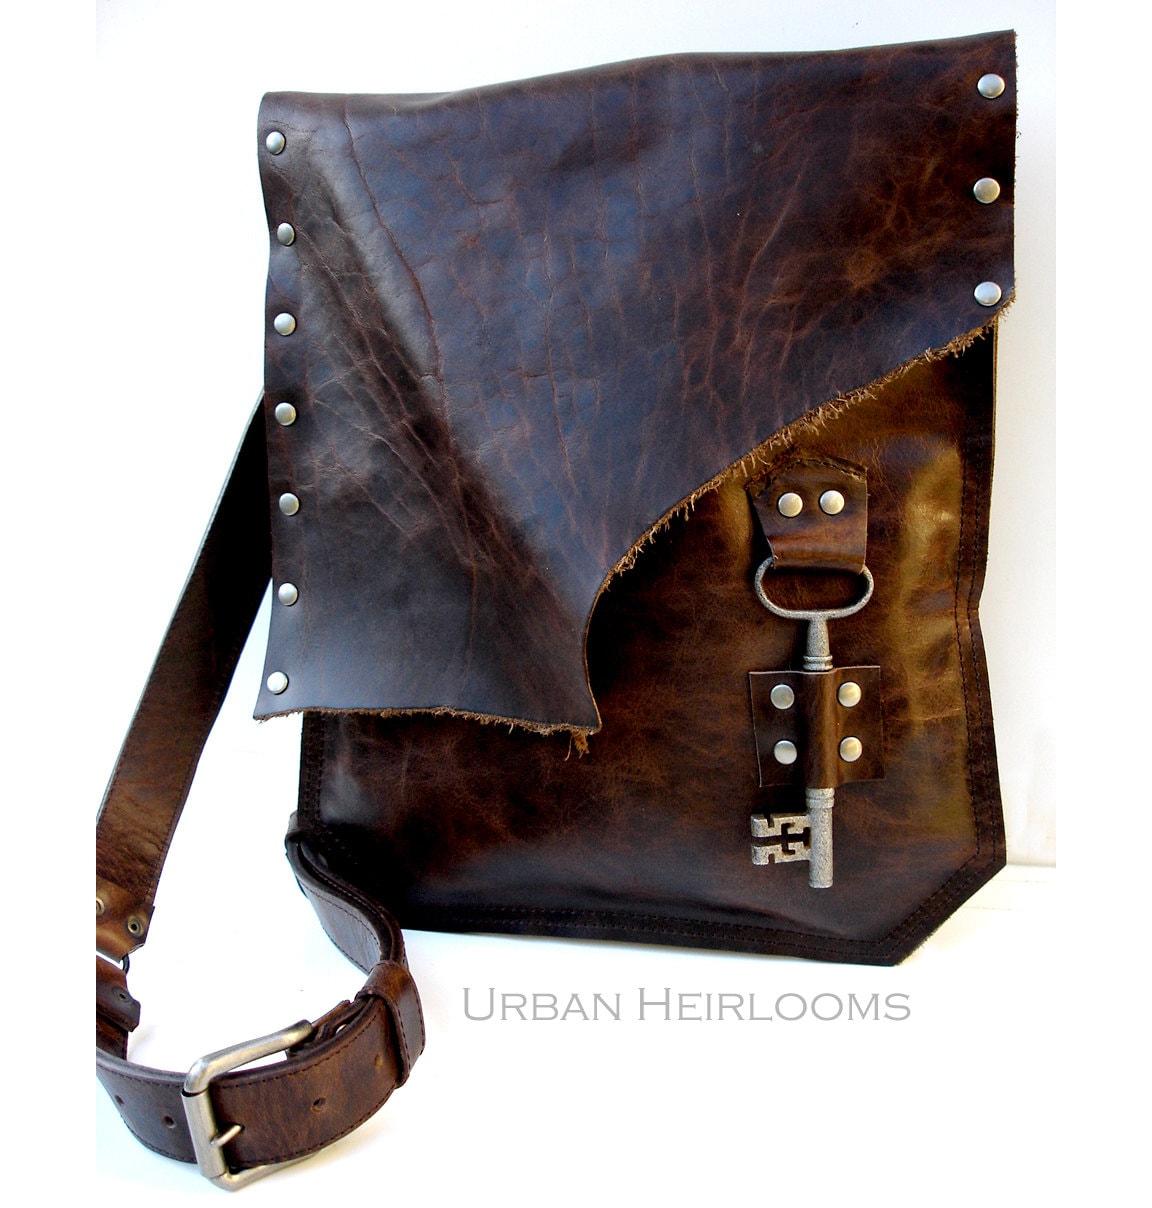 d6ed999f25 Sac besace en cuir marron rustique avec ancien clé de | Etsy